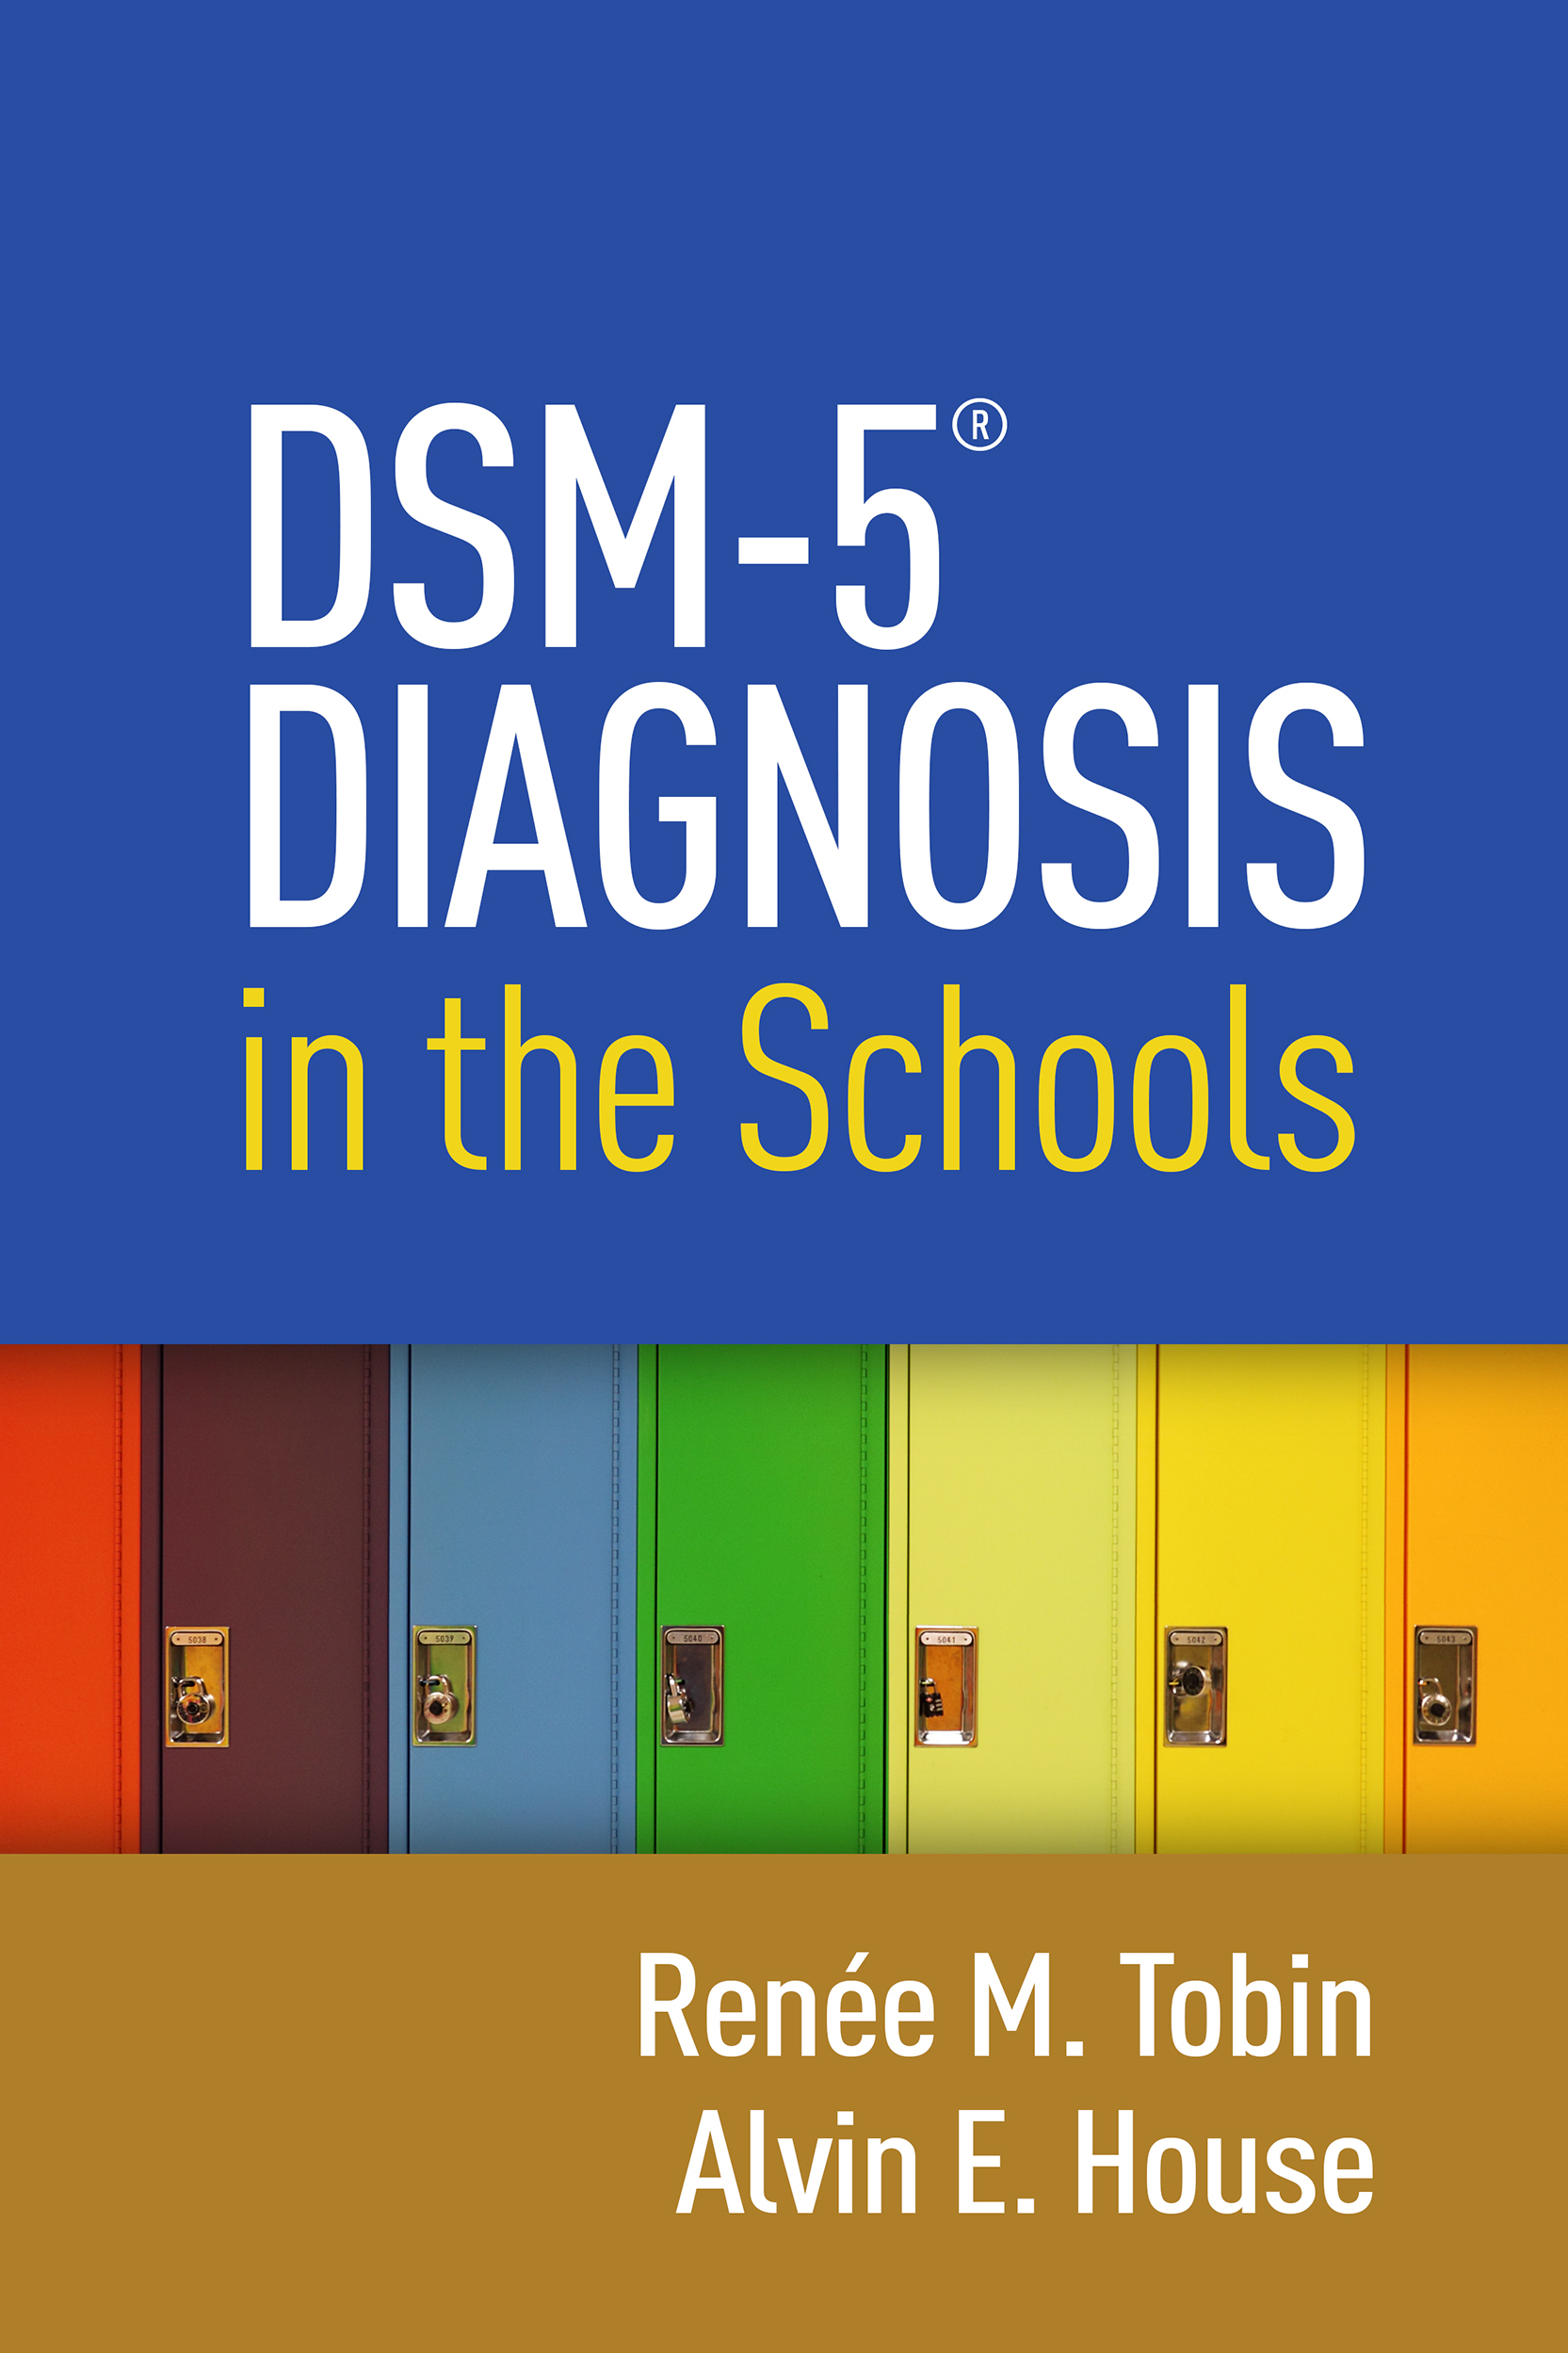 DSM-5® Diagnosis in the Schools  by  Renée M. Tobin